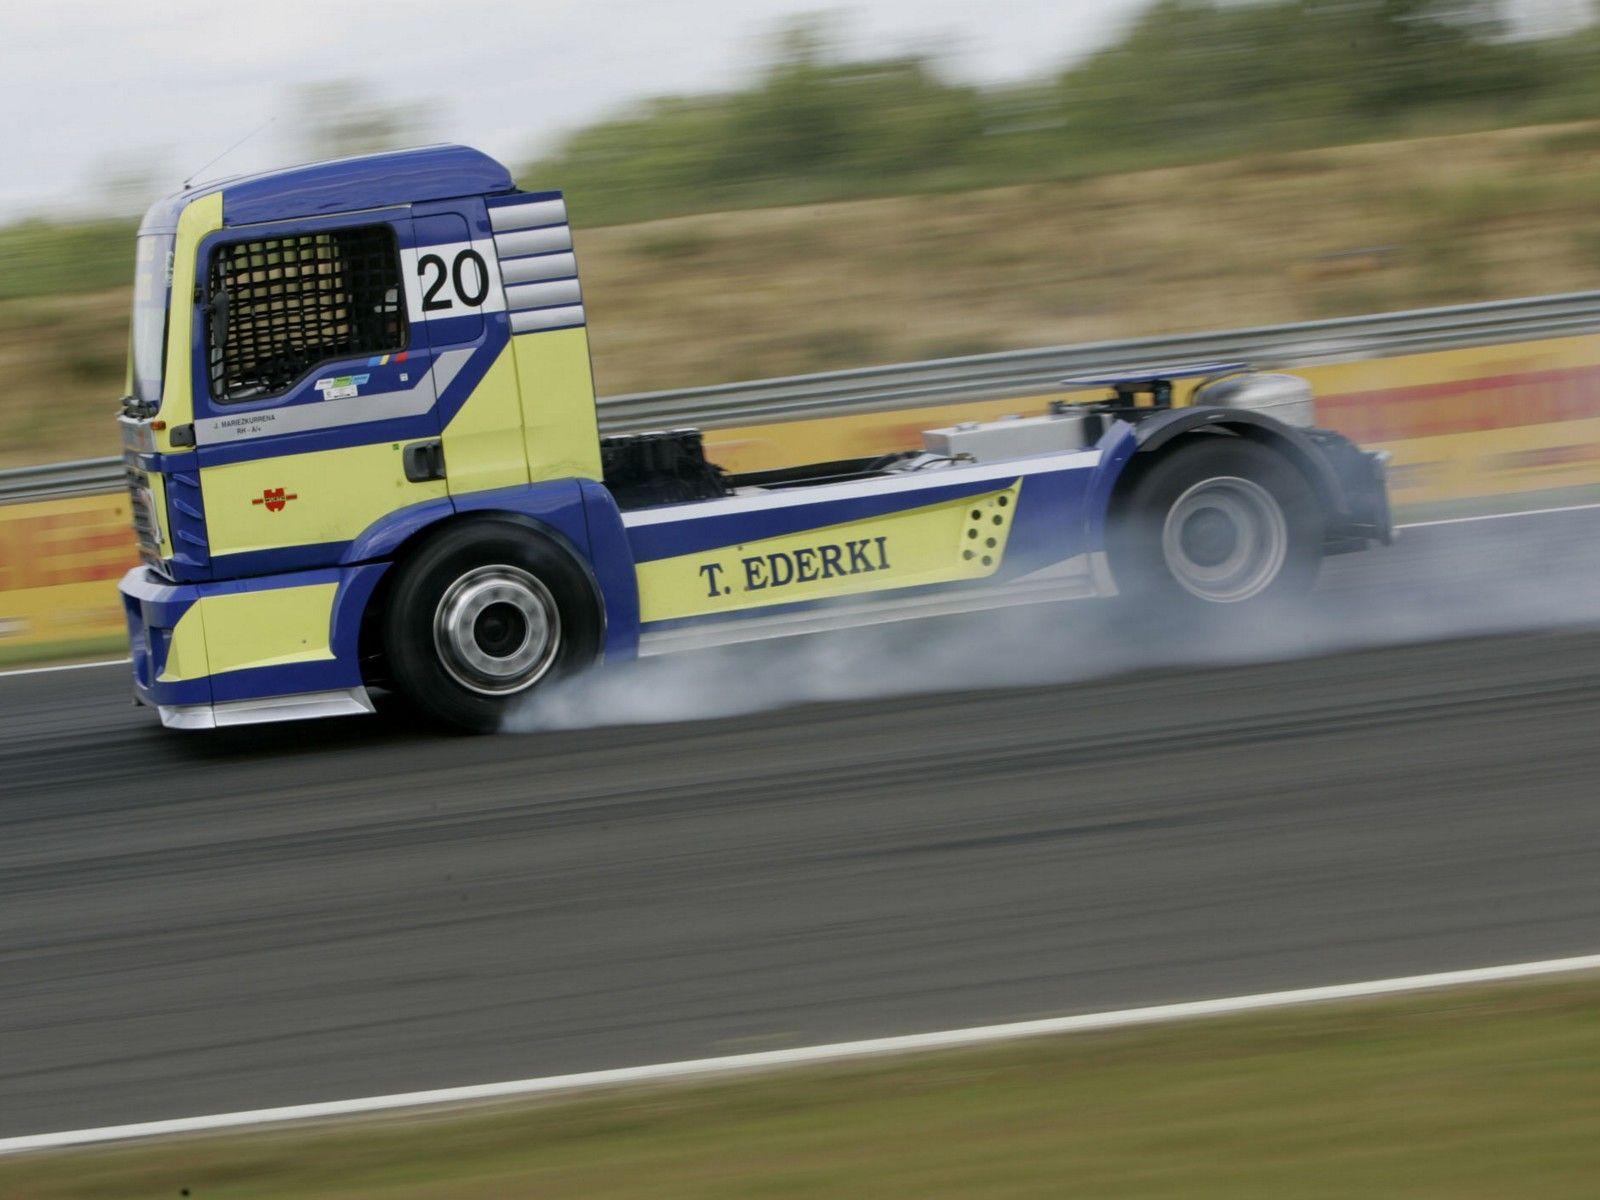 Semi truck racing 2006 man tg semi tractor truck trucks race racing wallpaper background